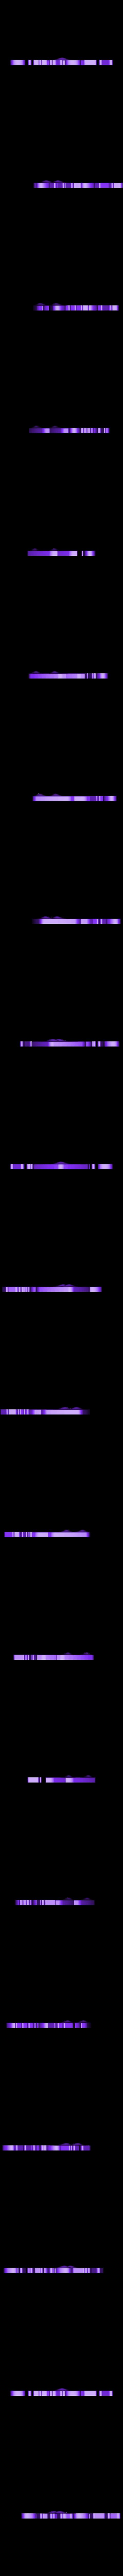 Citroen pieza 1.STL Download STL file Citroen key ring • Design to 3D print, nldise